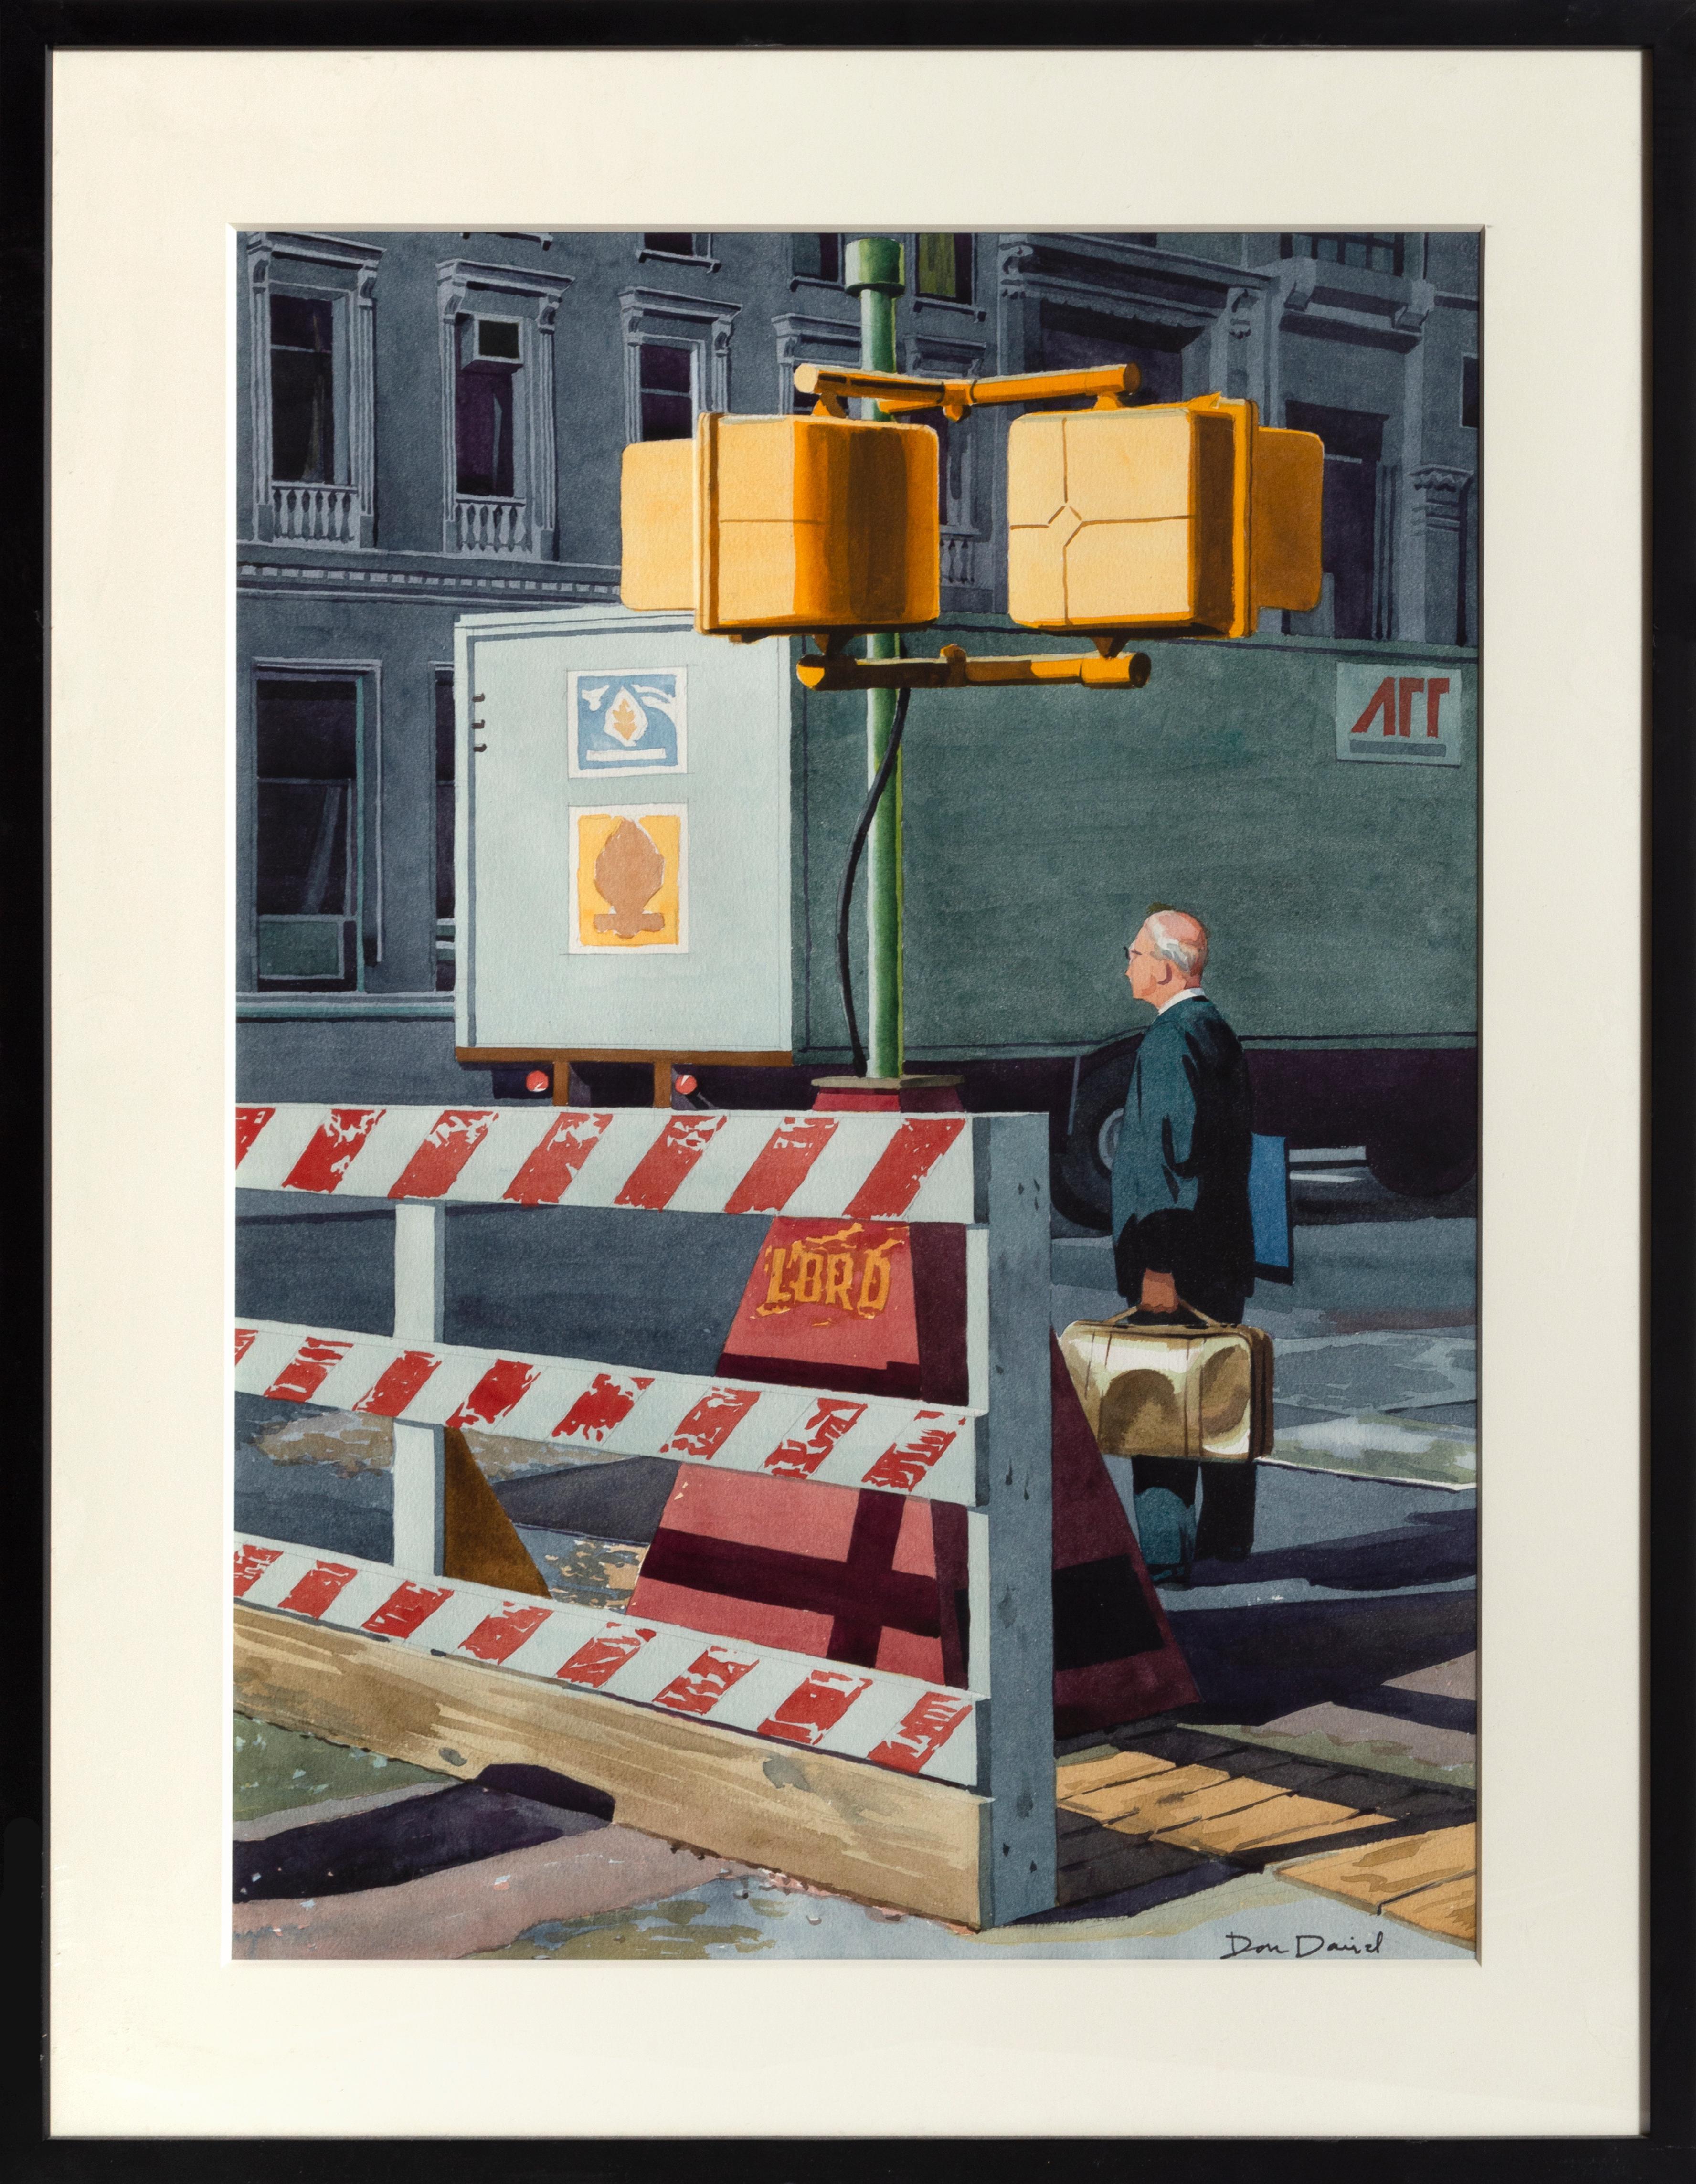 Crosswalk, New York City